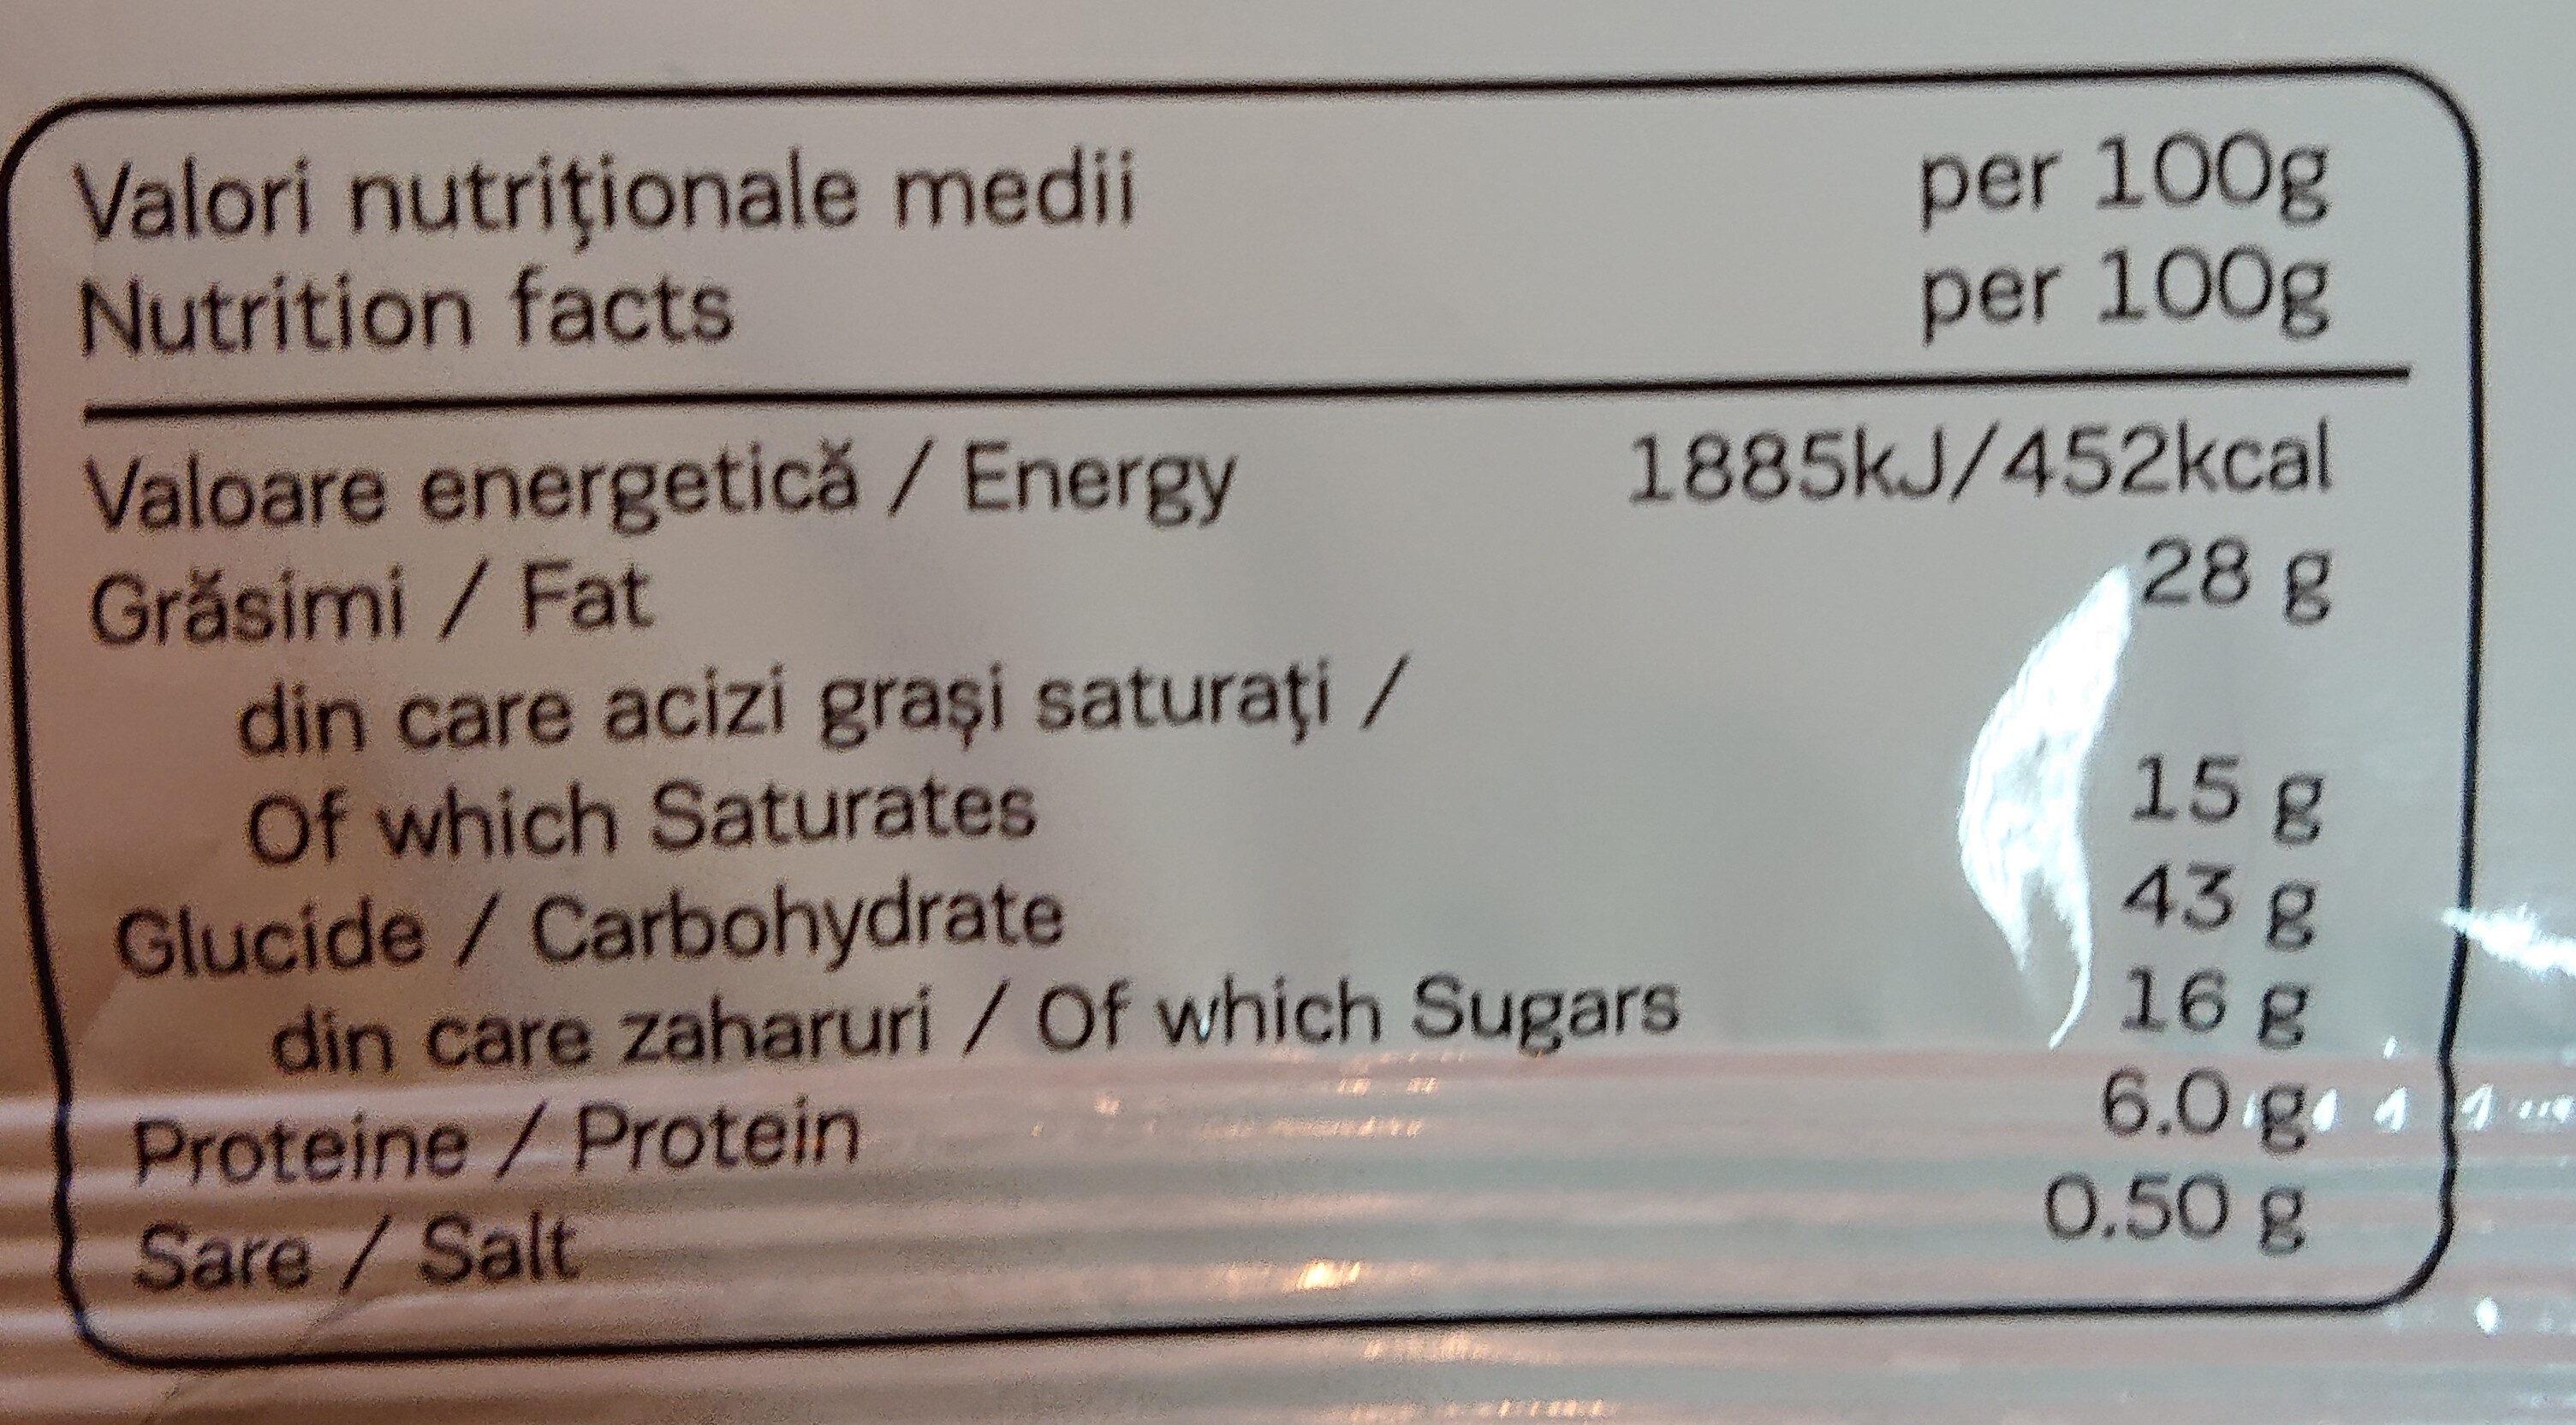 Double max croissant with cocoa and vanilla - Información nutricional - ro